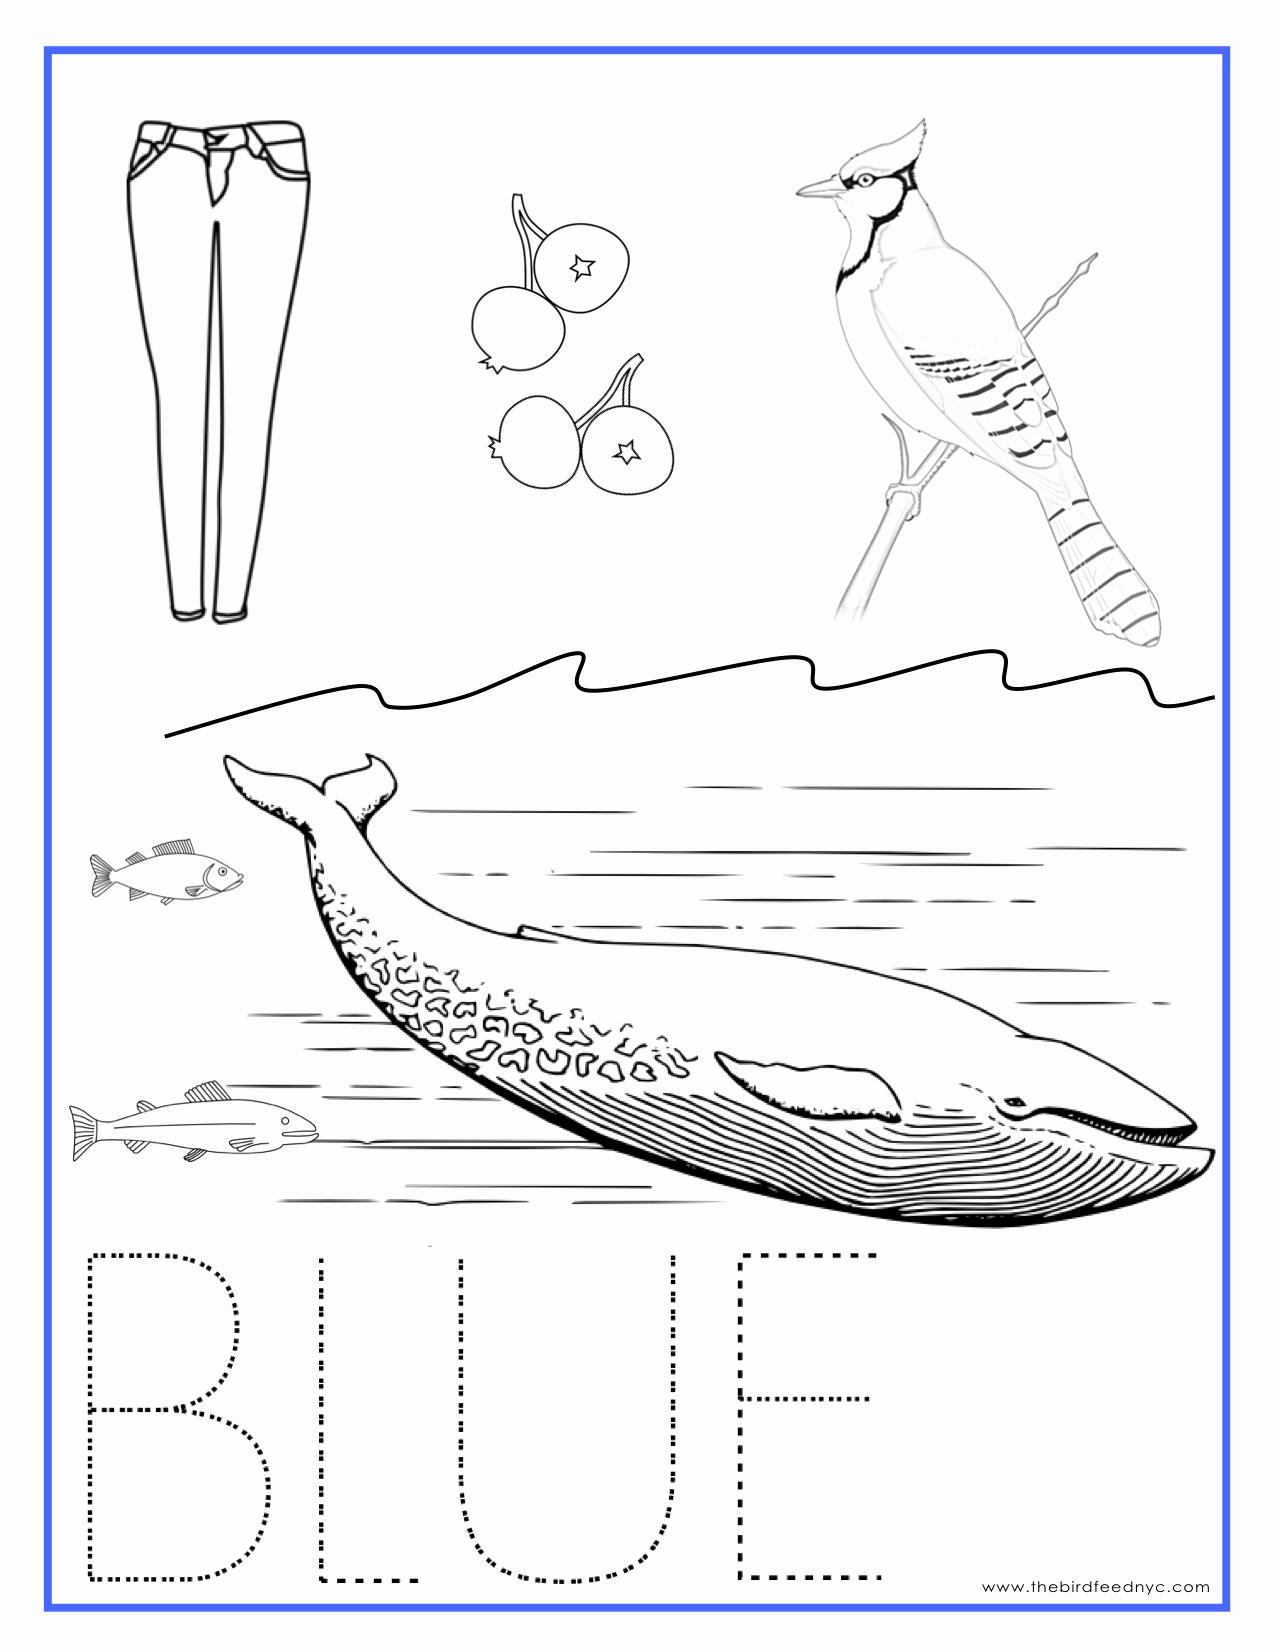 Color Blue Worksheets for Preschool Inspirational Printable Coloring Sheets